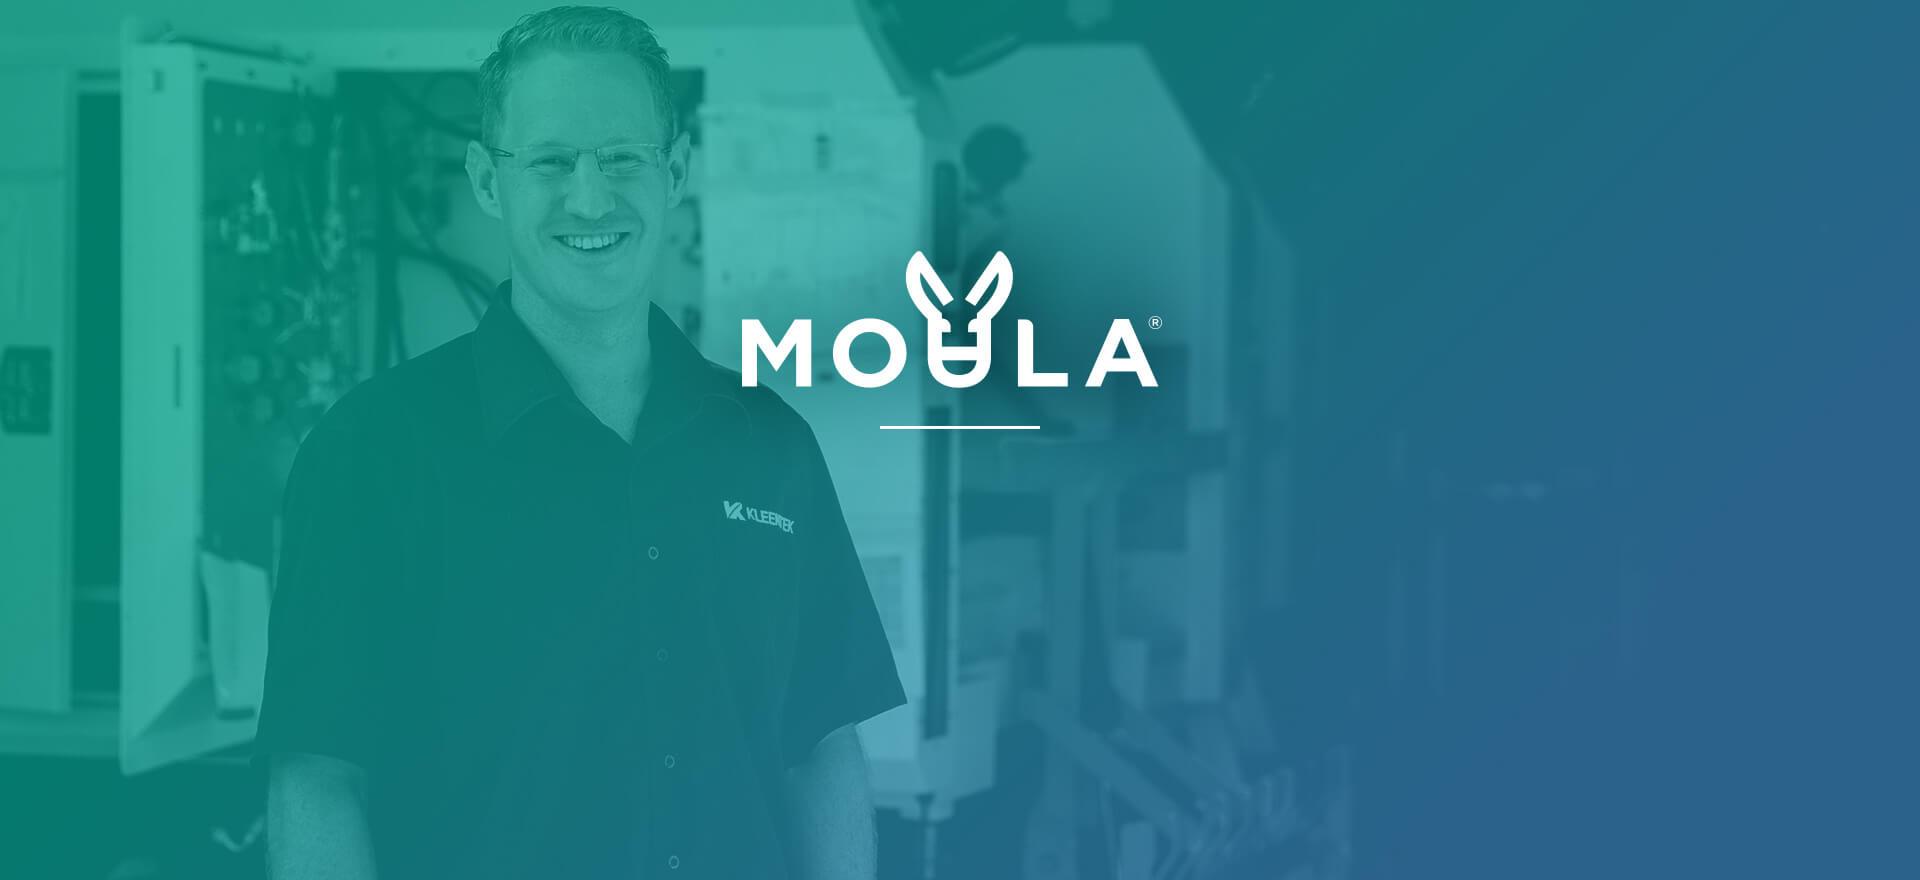 Introducing Moula